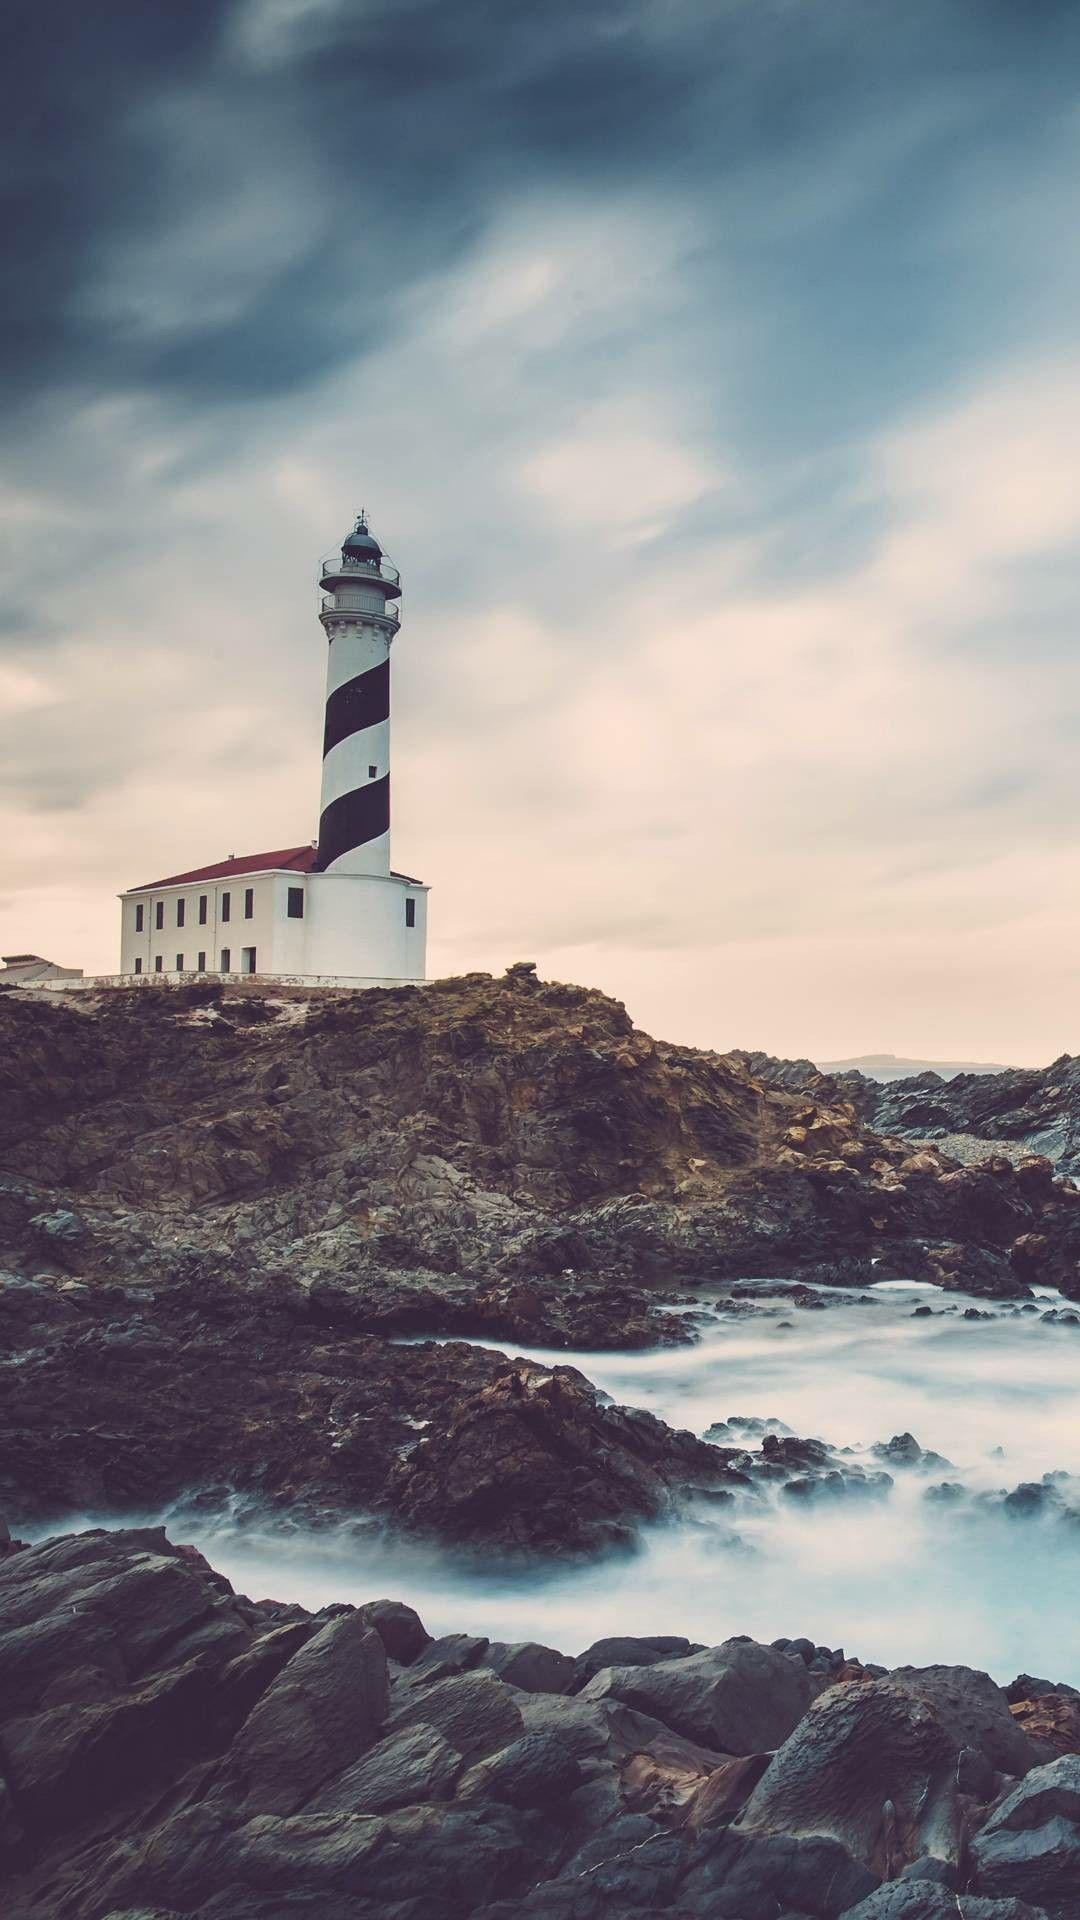 Lighthouse In 2019 Apple Wallpaper Lighthouse Technology